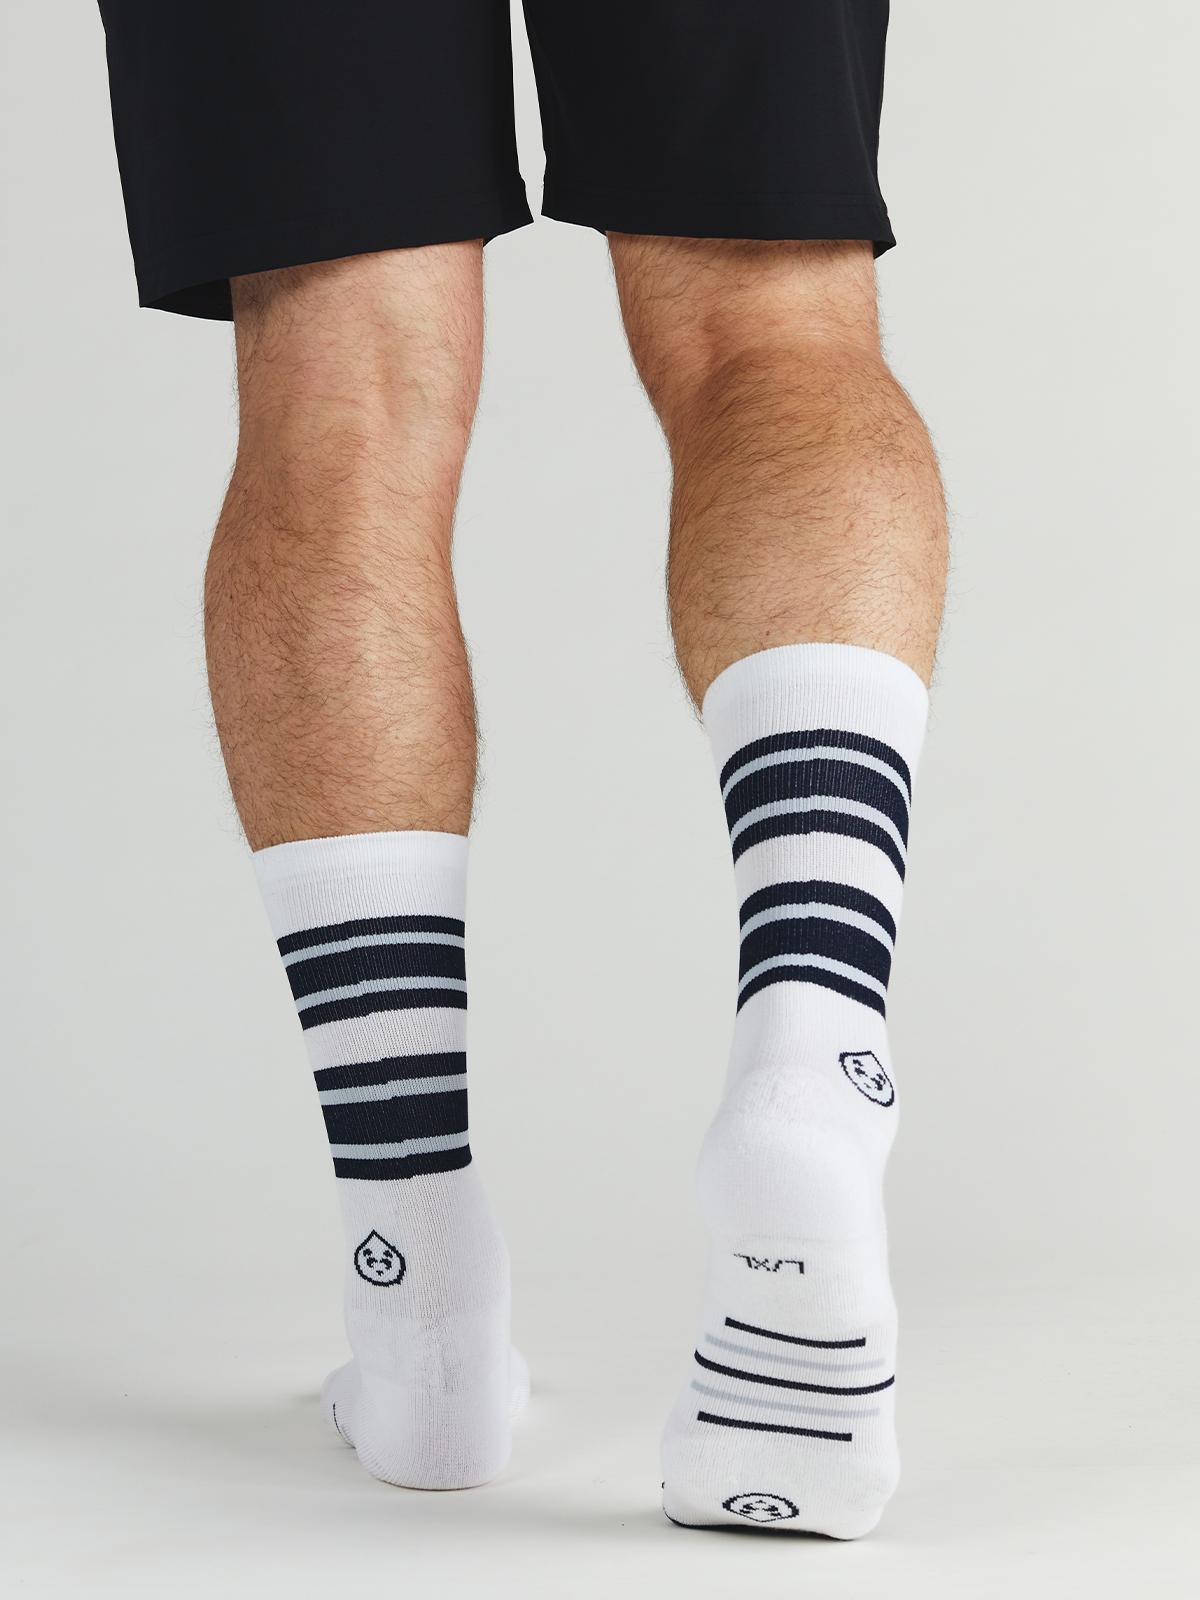 men's crew mid calf socks